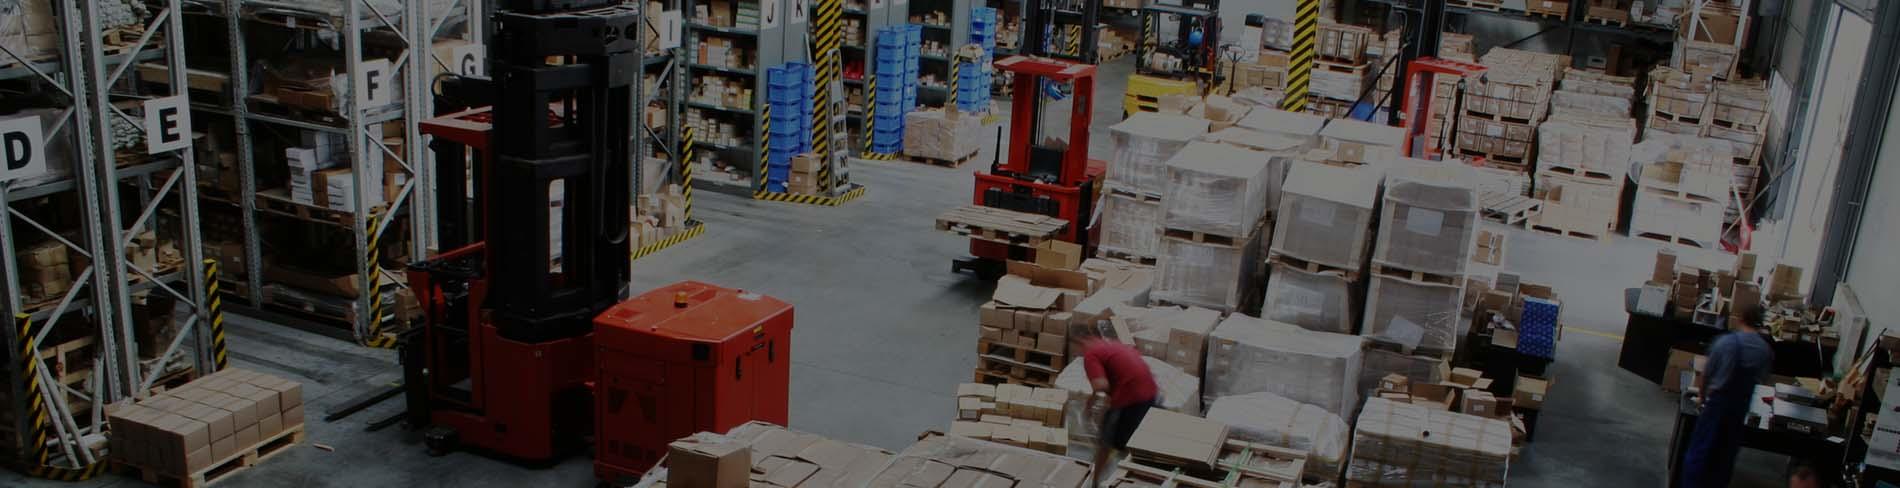 Warehouse Material Handling